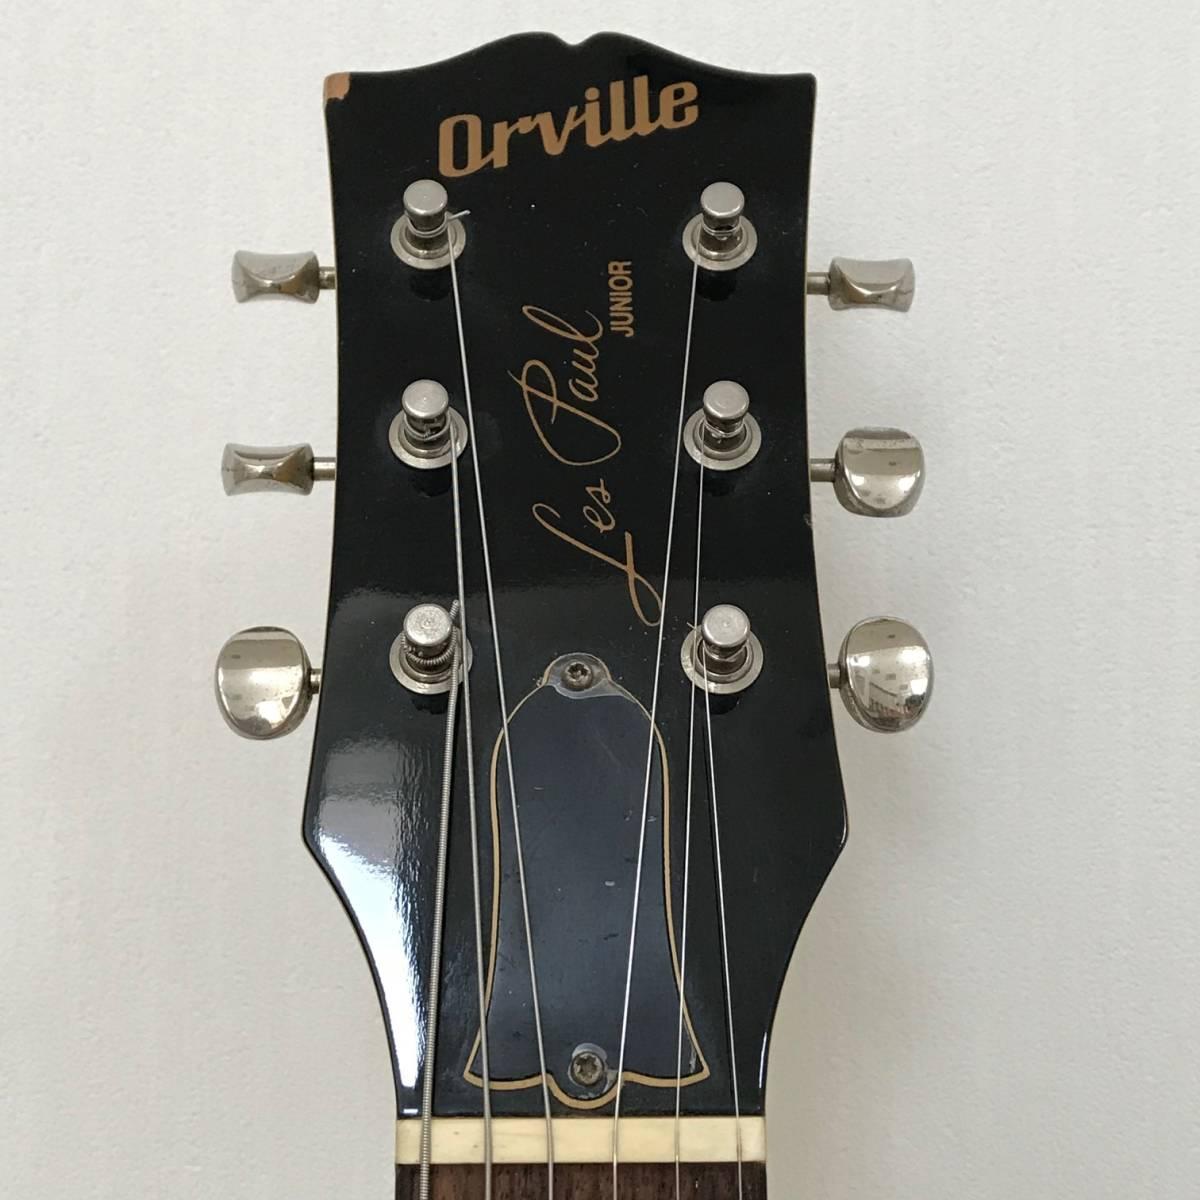 Orville by Gibson Les Paul Junior オービル バイ ギブソン レスポールジュニア イエロー 重量3.6kg_画像2